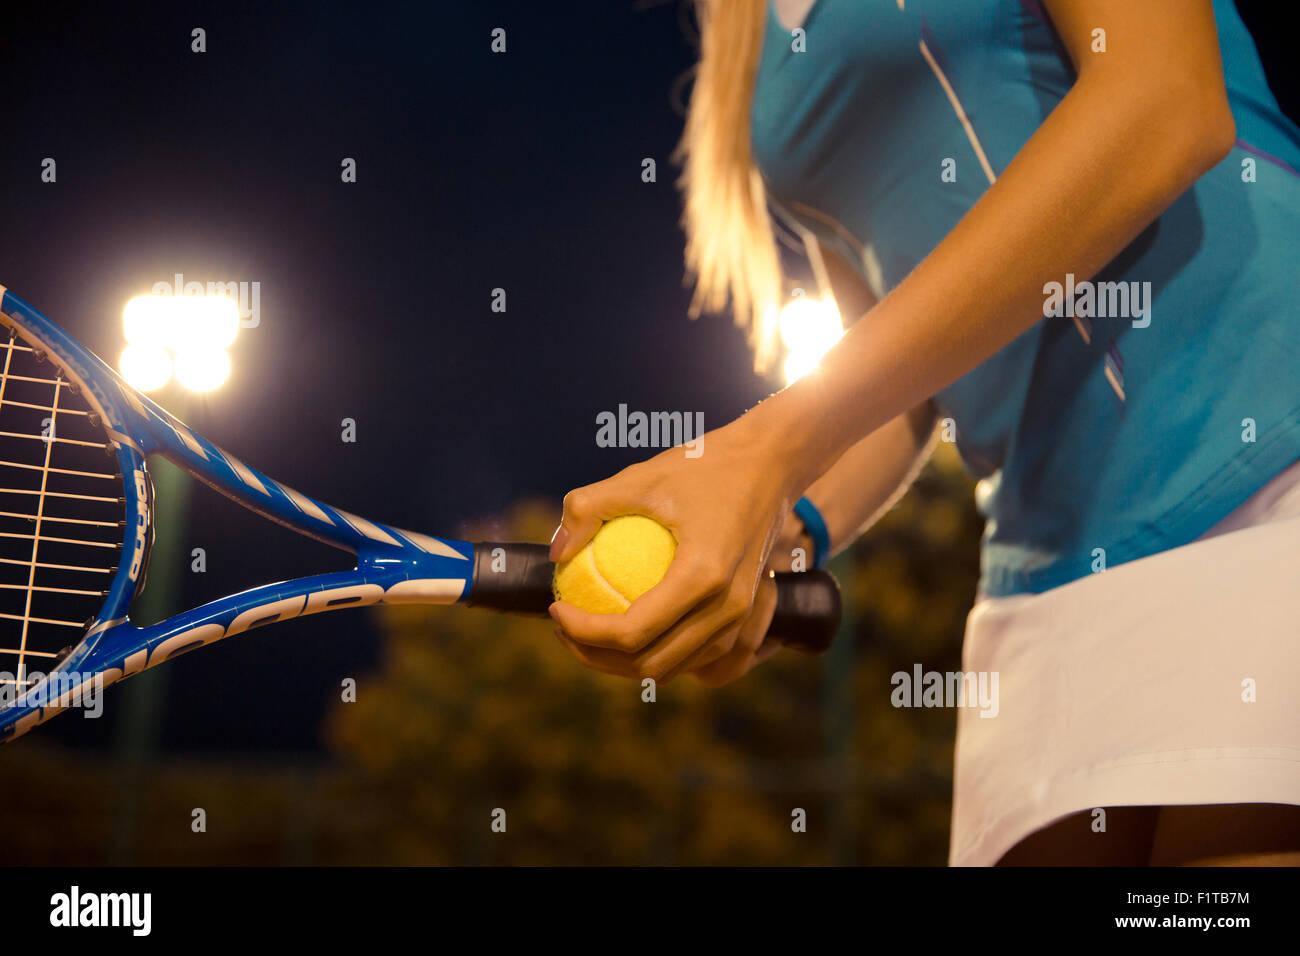 Closeup portrait of a tennis player holding racket et ball Photo Stock